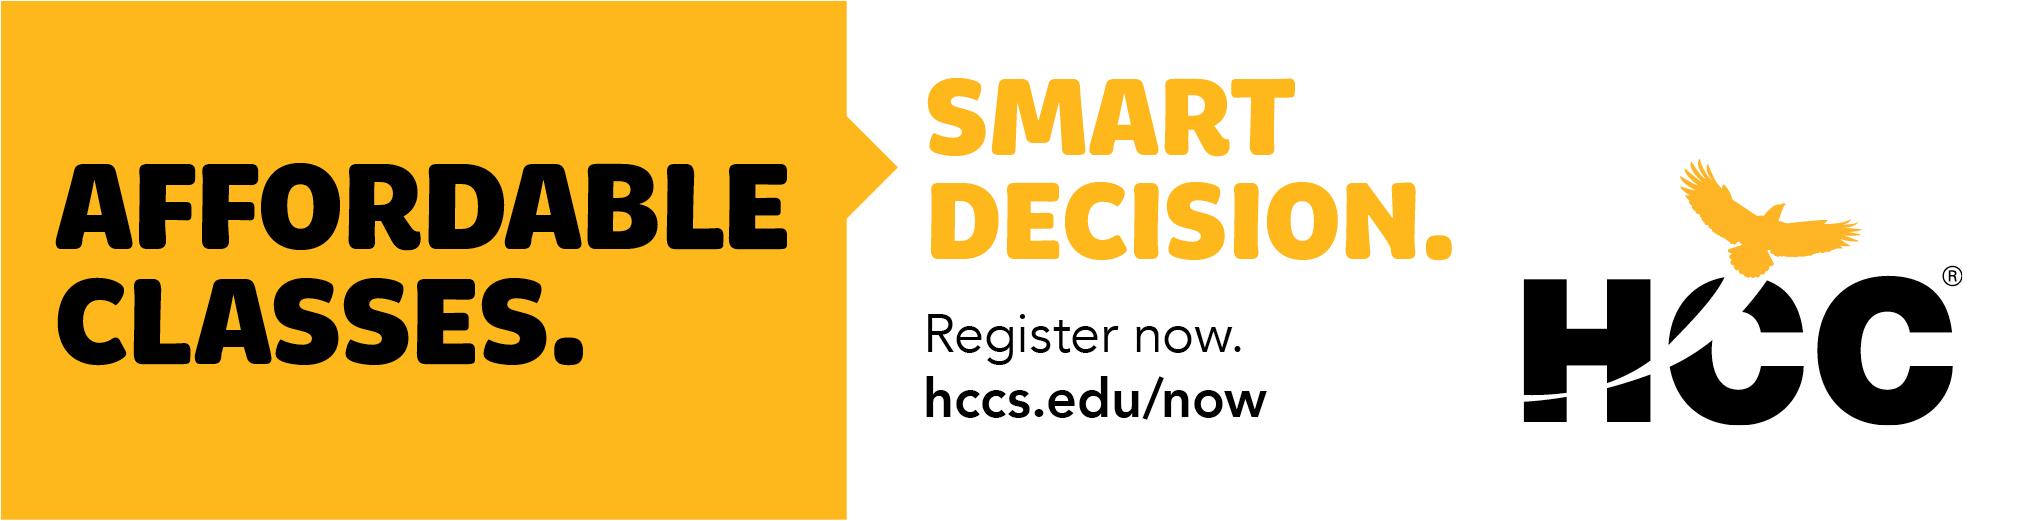 Hcc Winter Mini Session | Houston Community College - Hcc pertaining to Houston Communiry College Calender